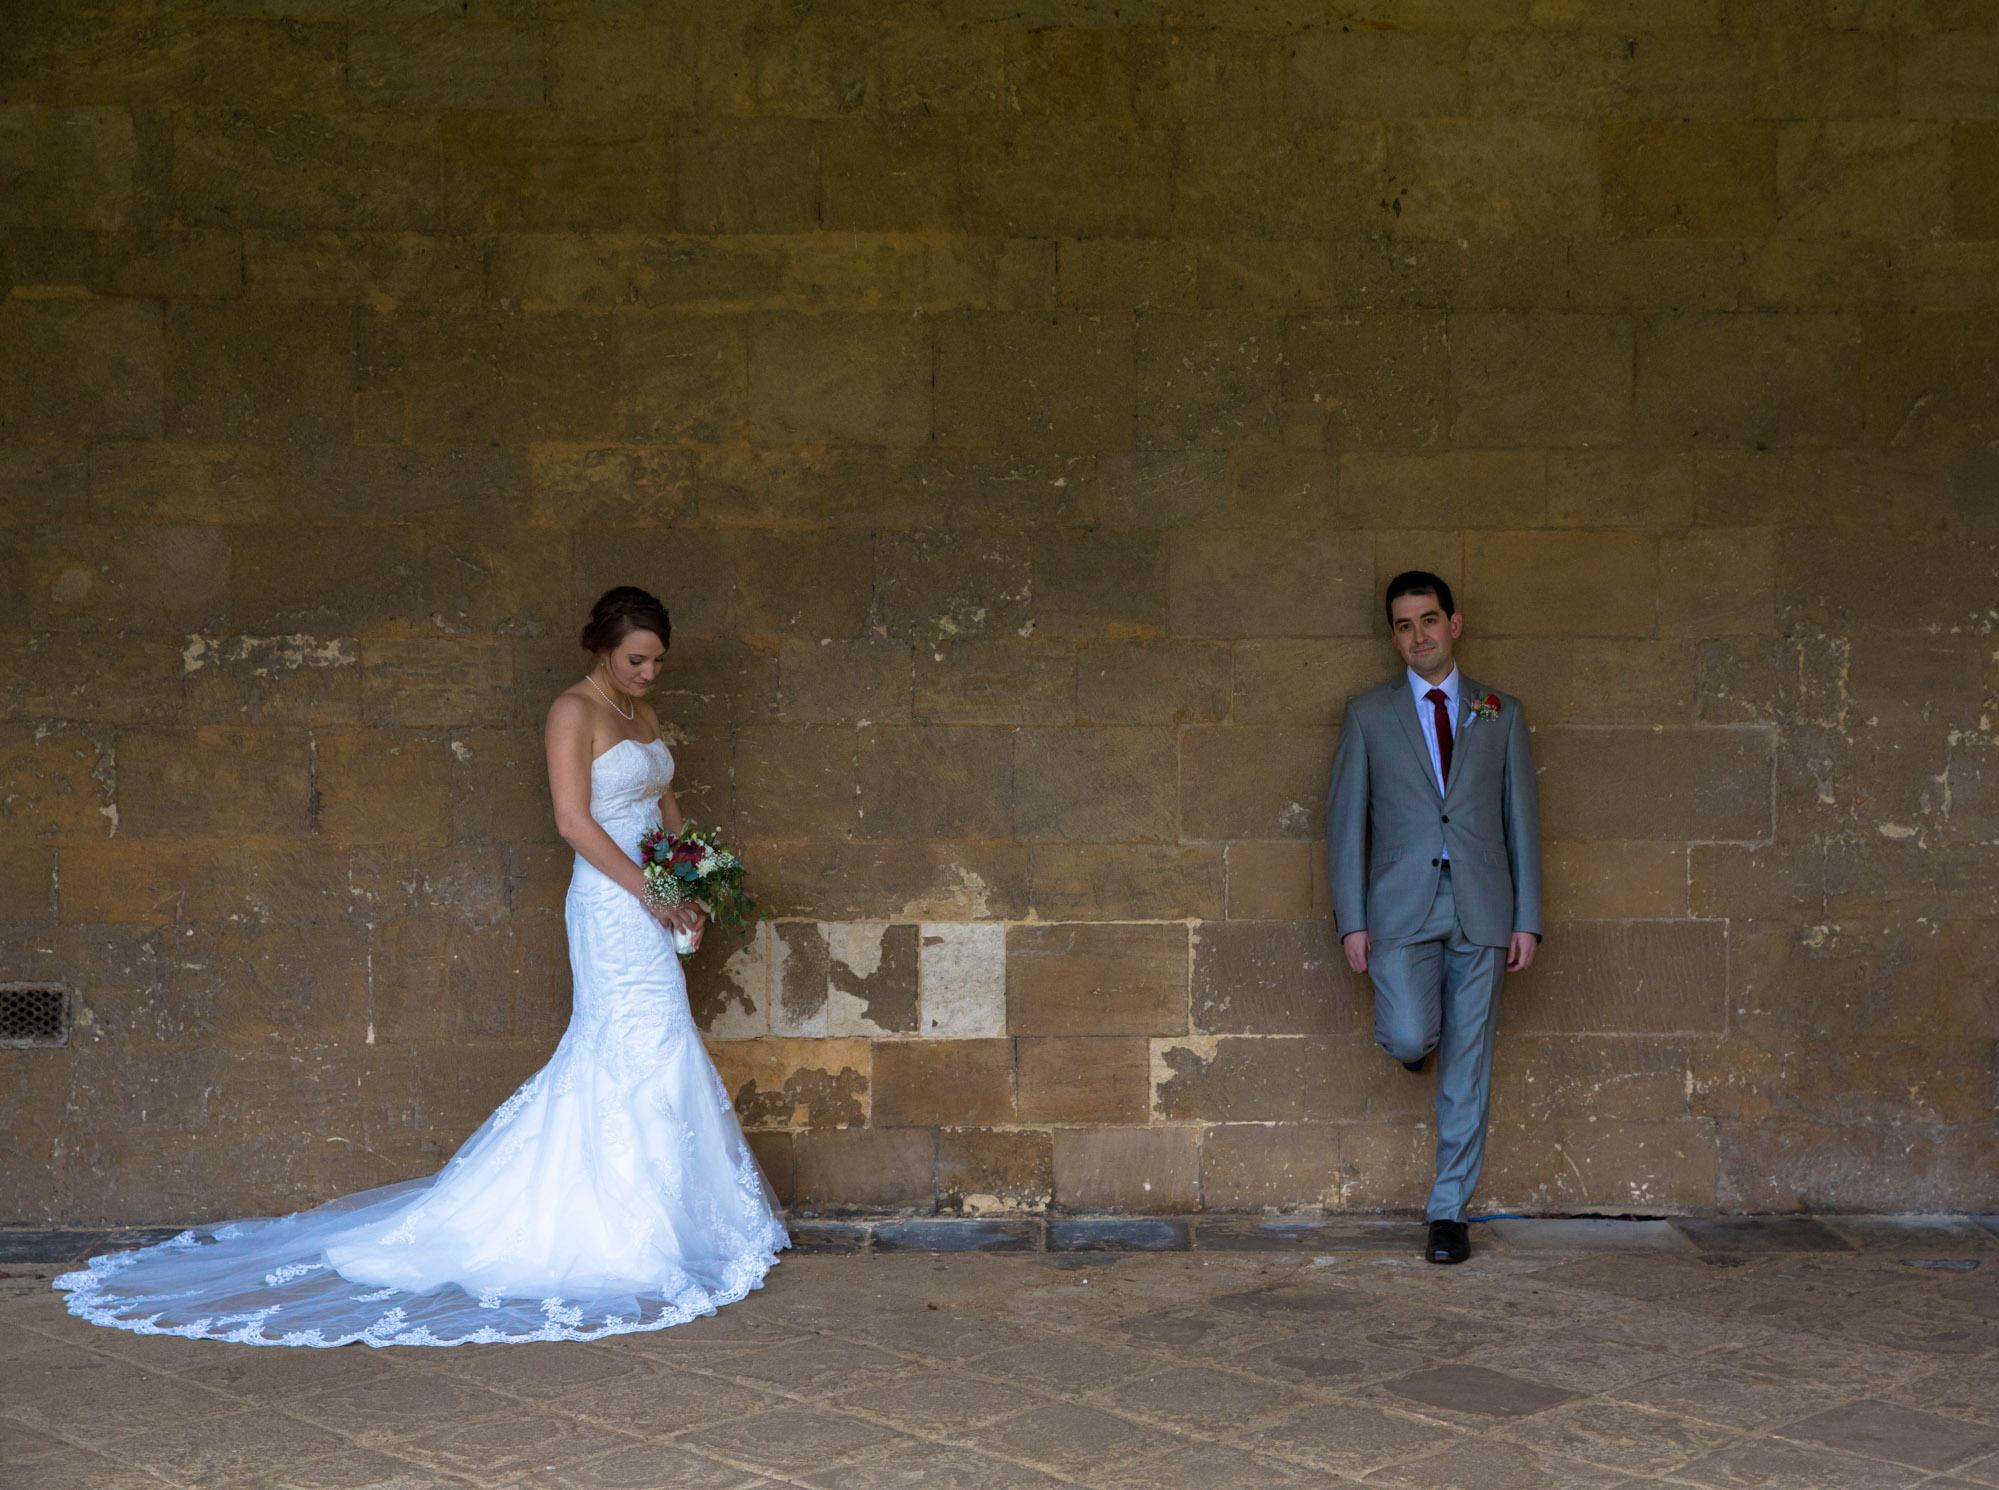 weddings-couples-love-photographer-oxford-london-jonathan-self-photography-74.jpg